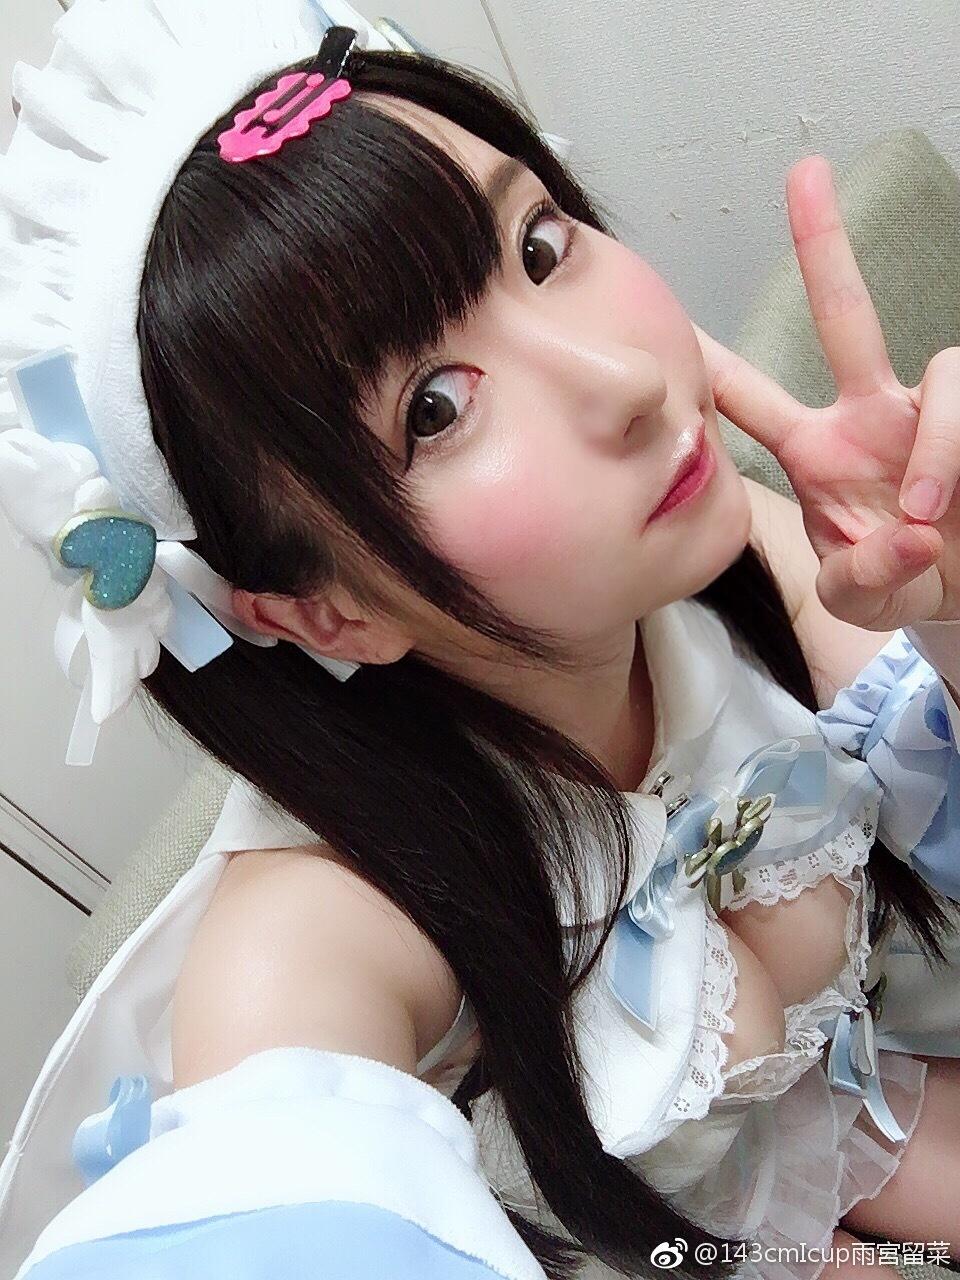 143cmIcup雨宮留菜我住在日本,我想见到你。请支持! _美女福利图片